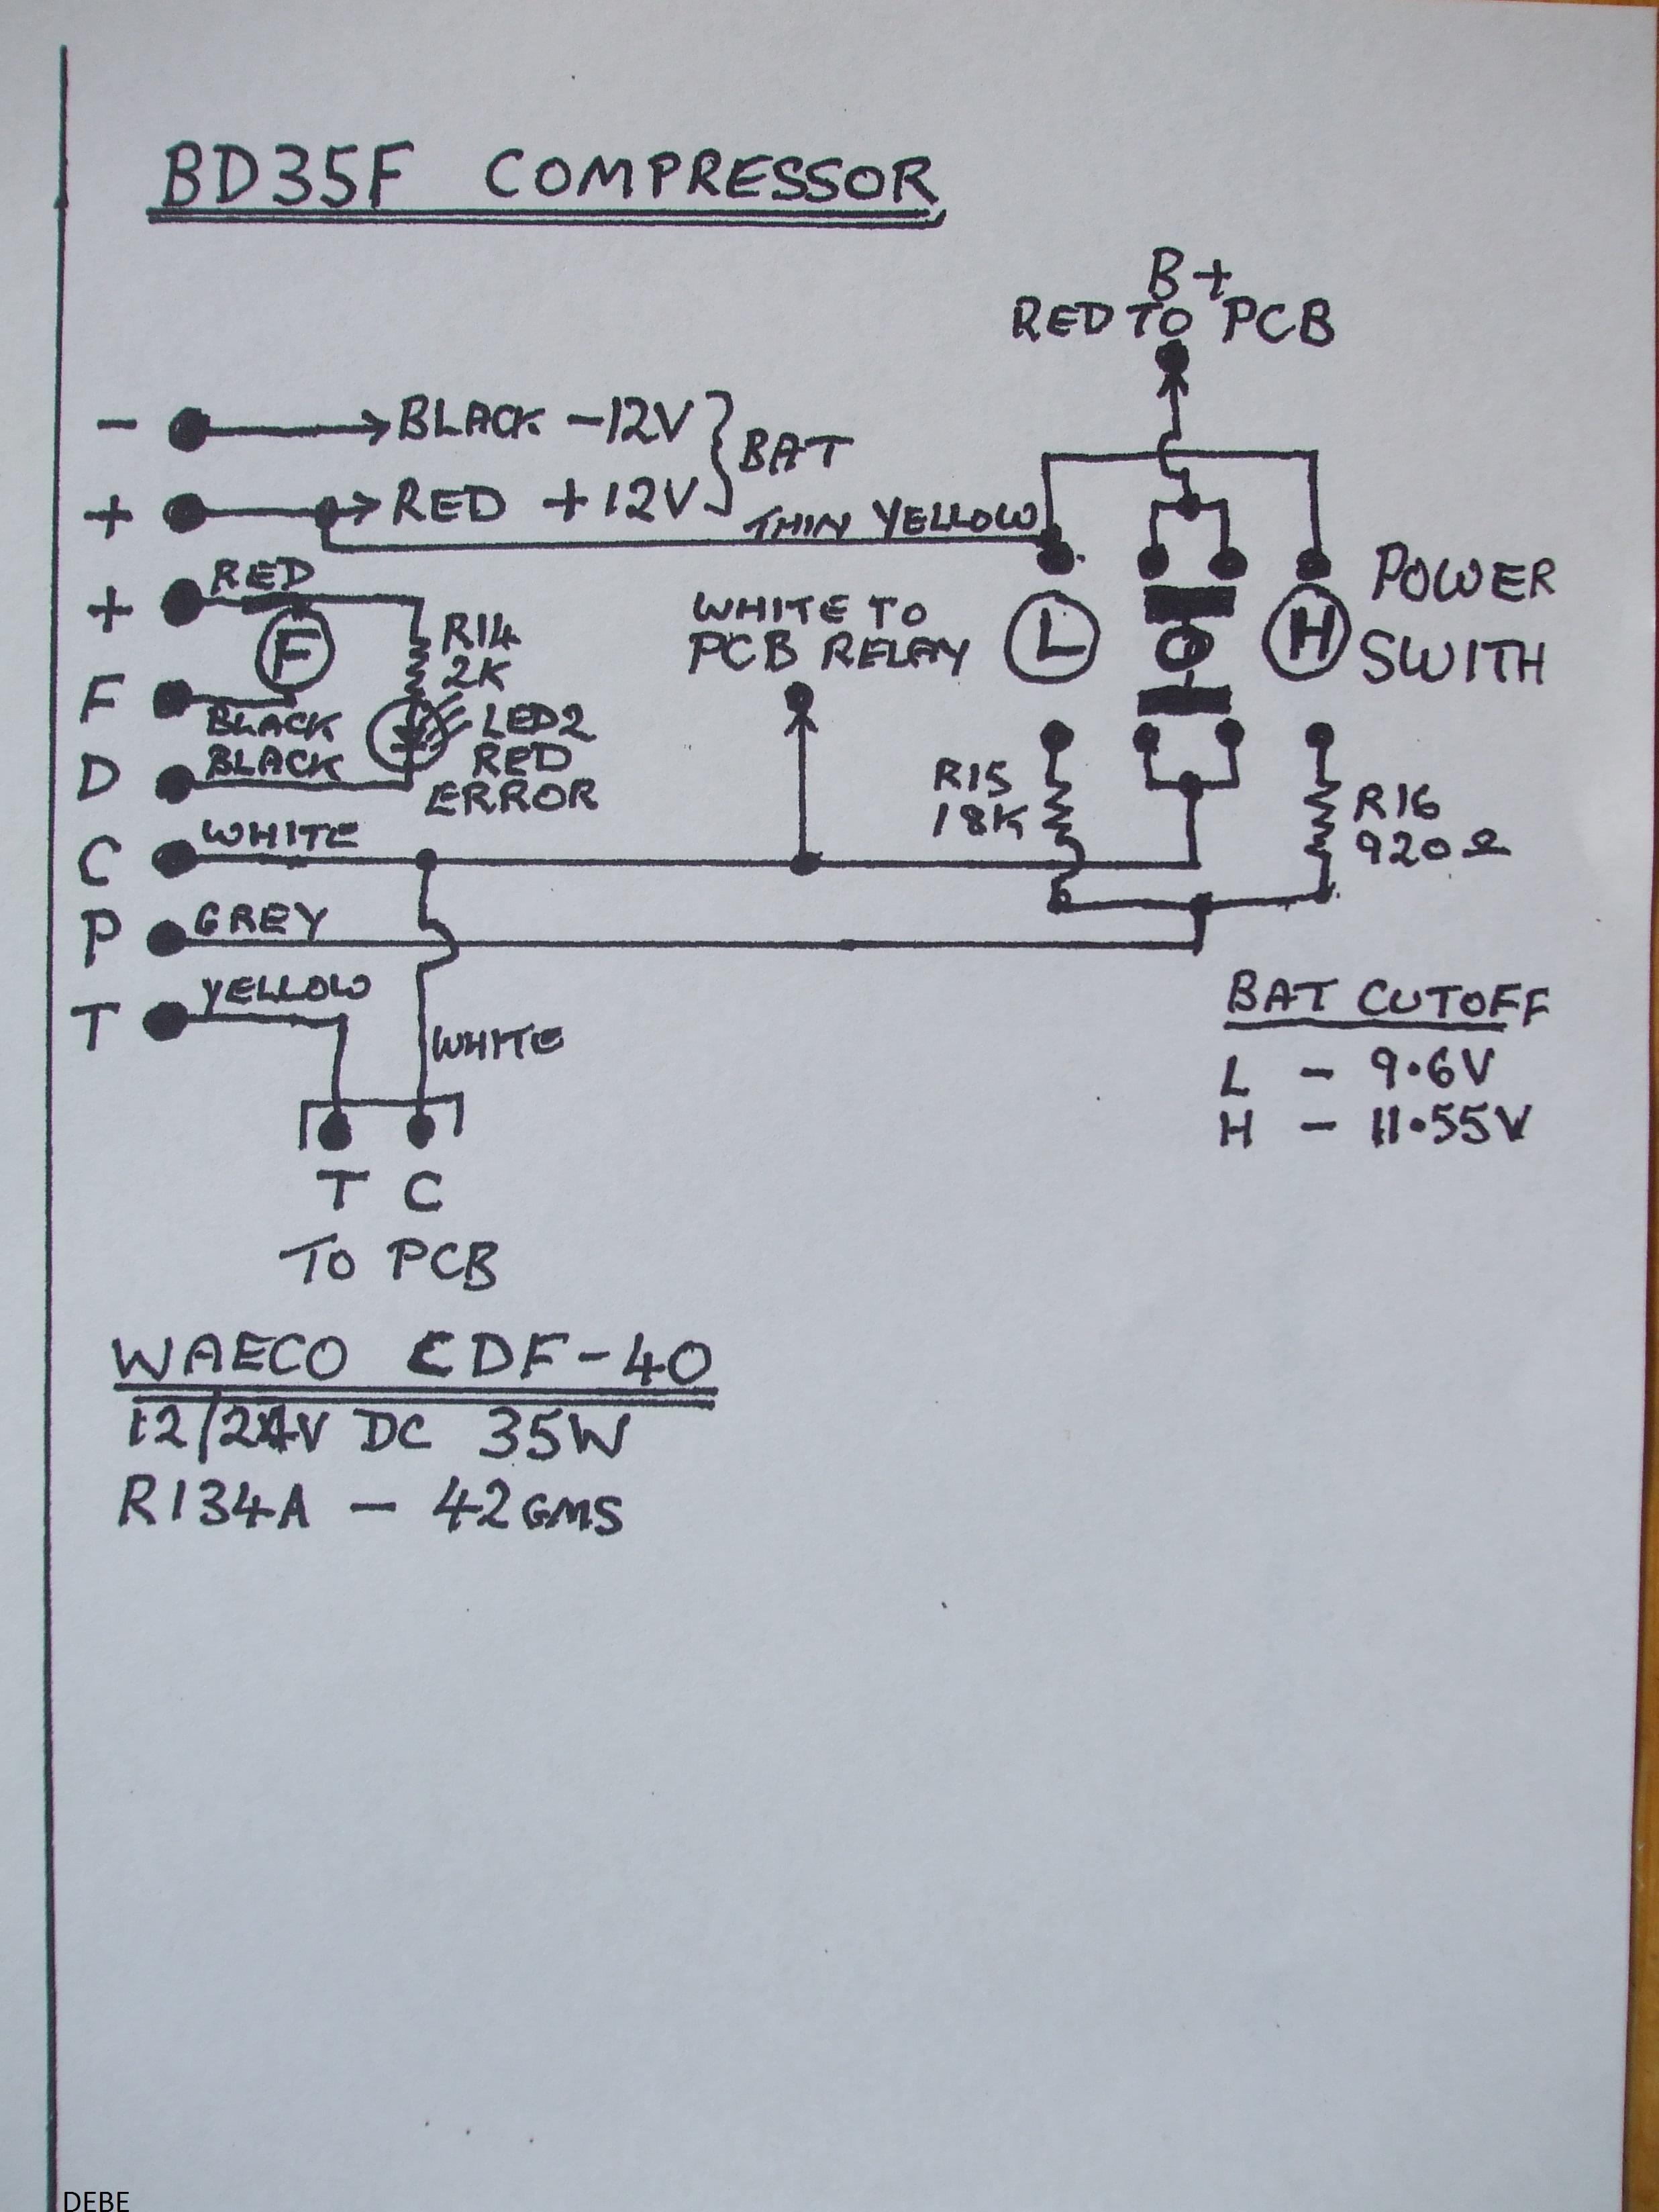 WAECO CDF-40 .5.JPG